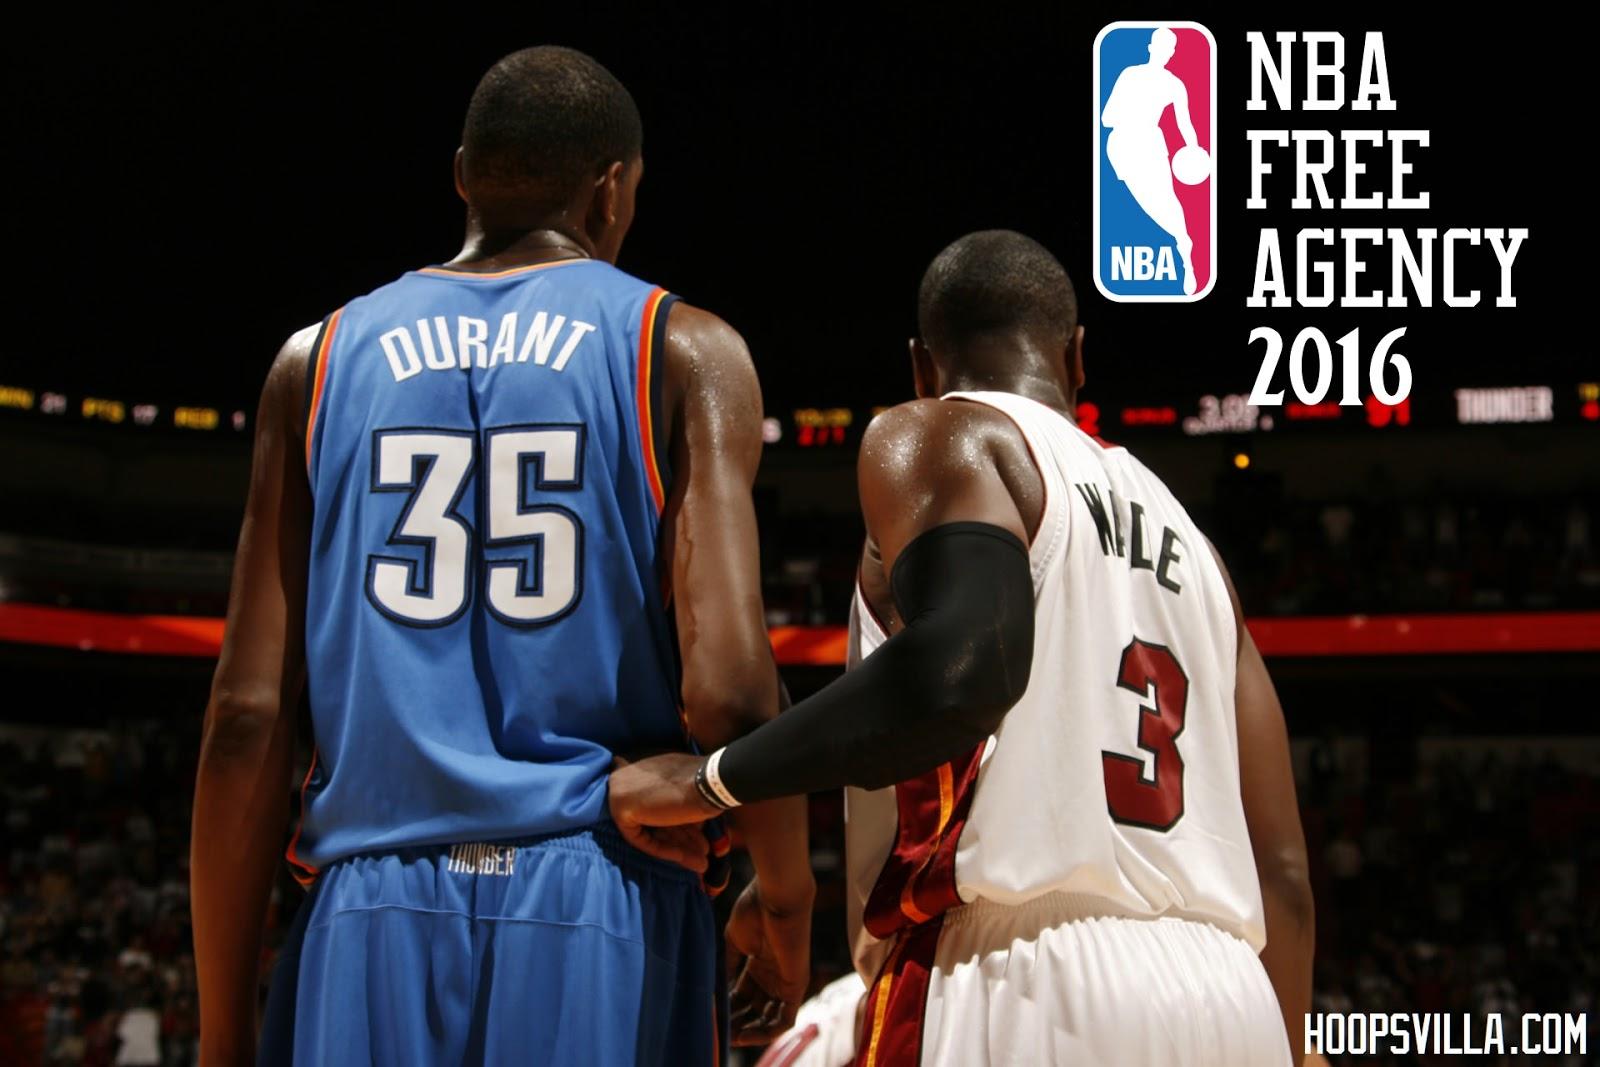 HoopsVilla.com: Basketball, NBA 2k17, NBA 2k16, NBA 2k14